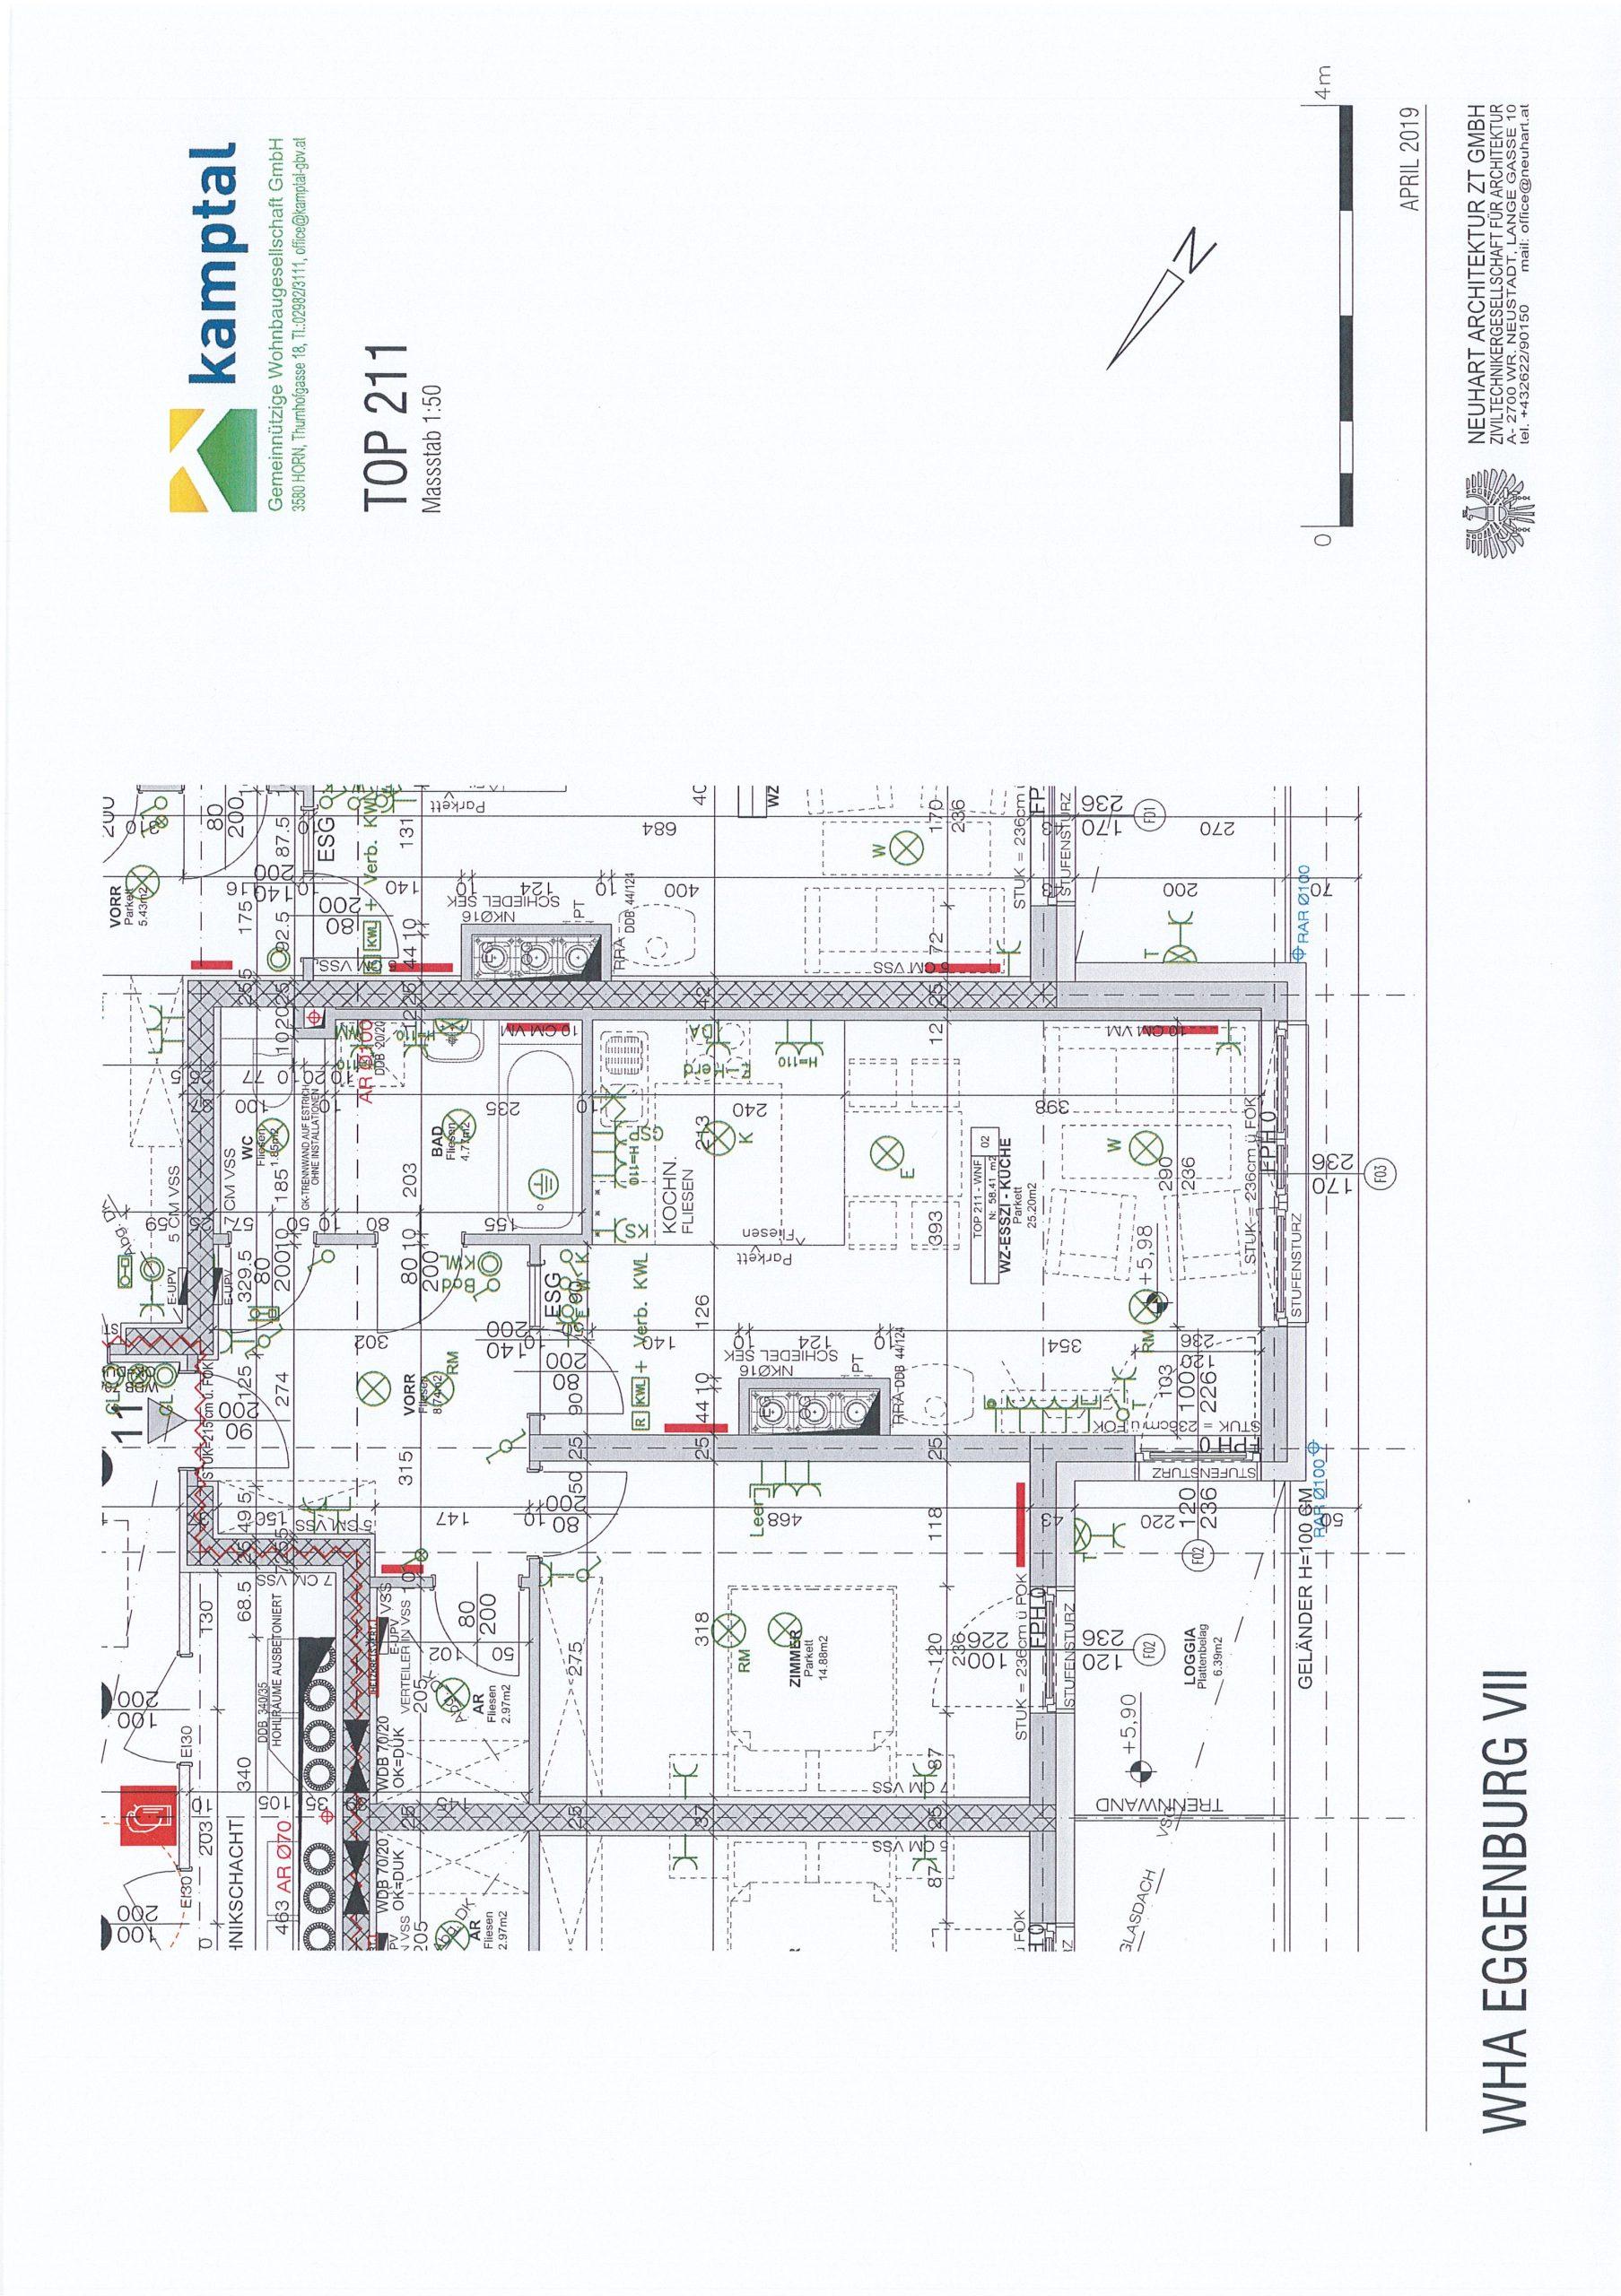 Immobilie von Kamptal in 3730 Eggenburg, Horn, Eggenburg VII - Top 211 #5